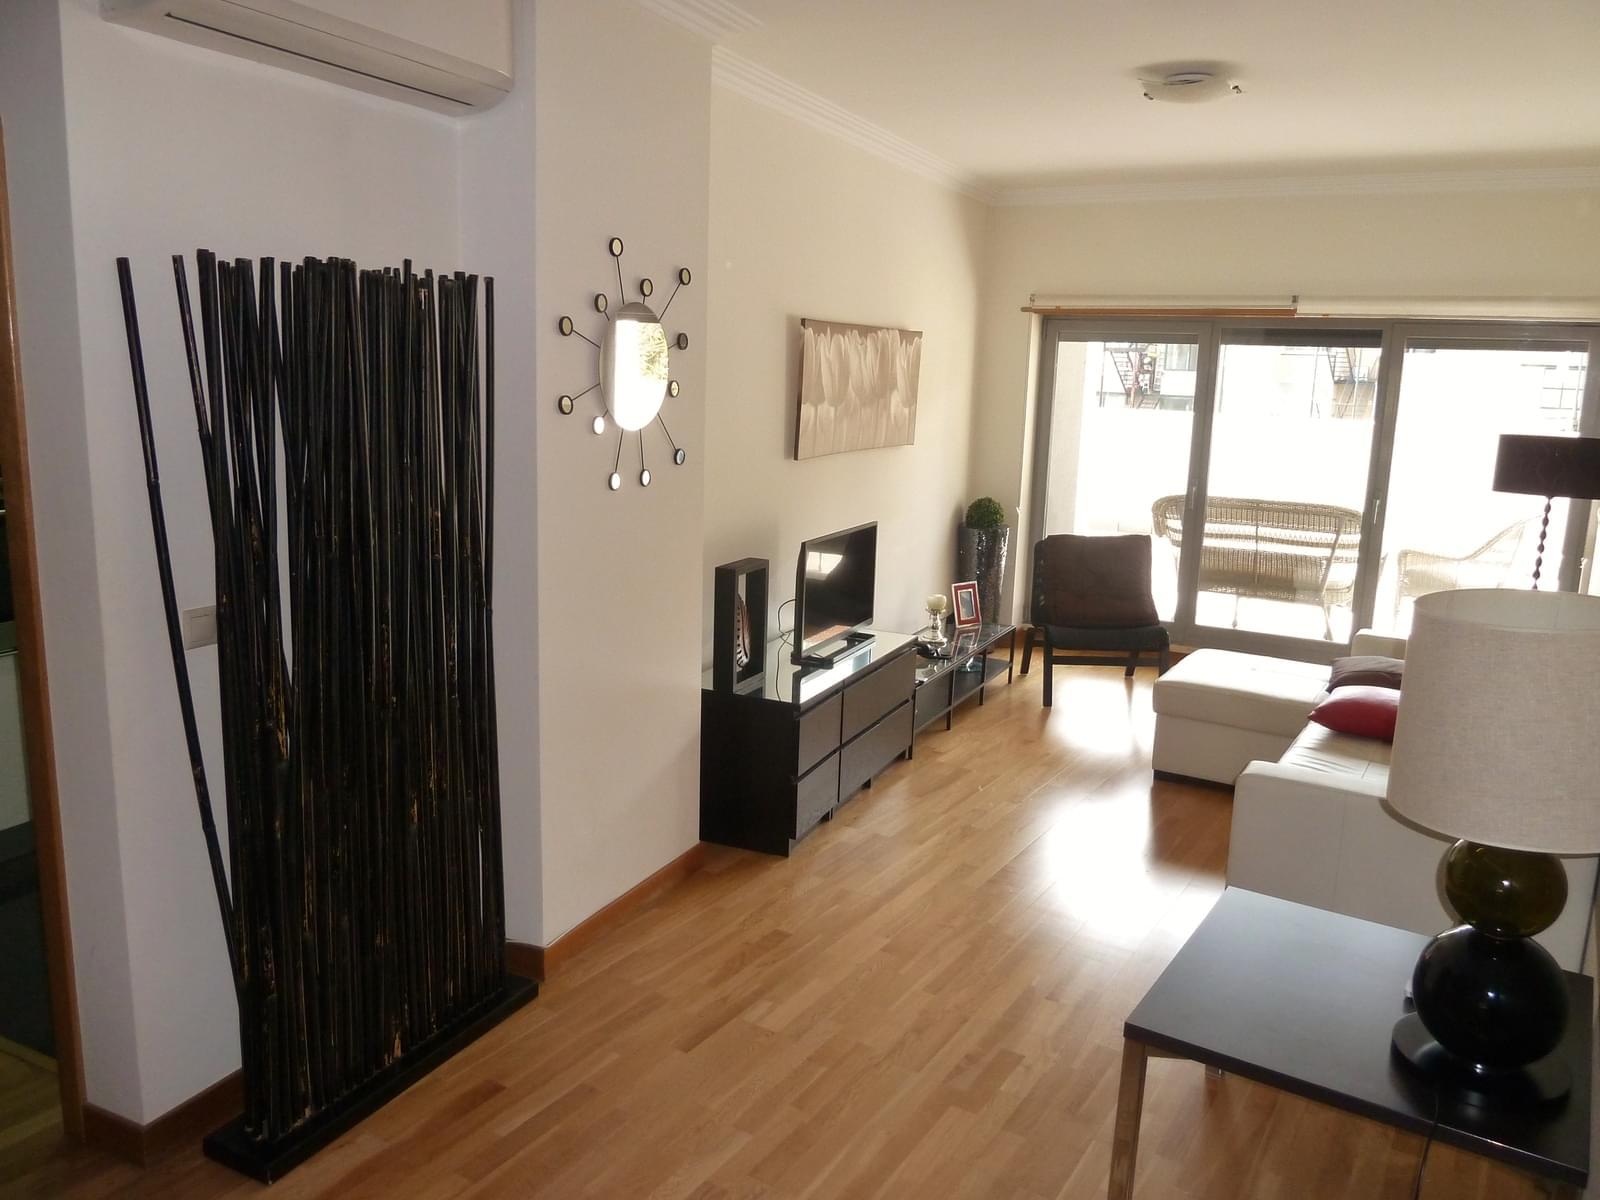 pf16882-apartamento-t2-lisboa-6ee4ef76-e53c-4772-ae7c-14891bbabf2e